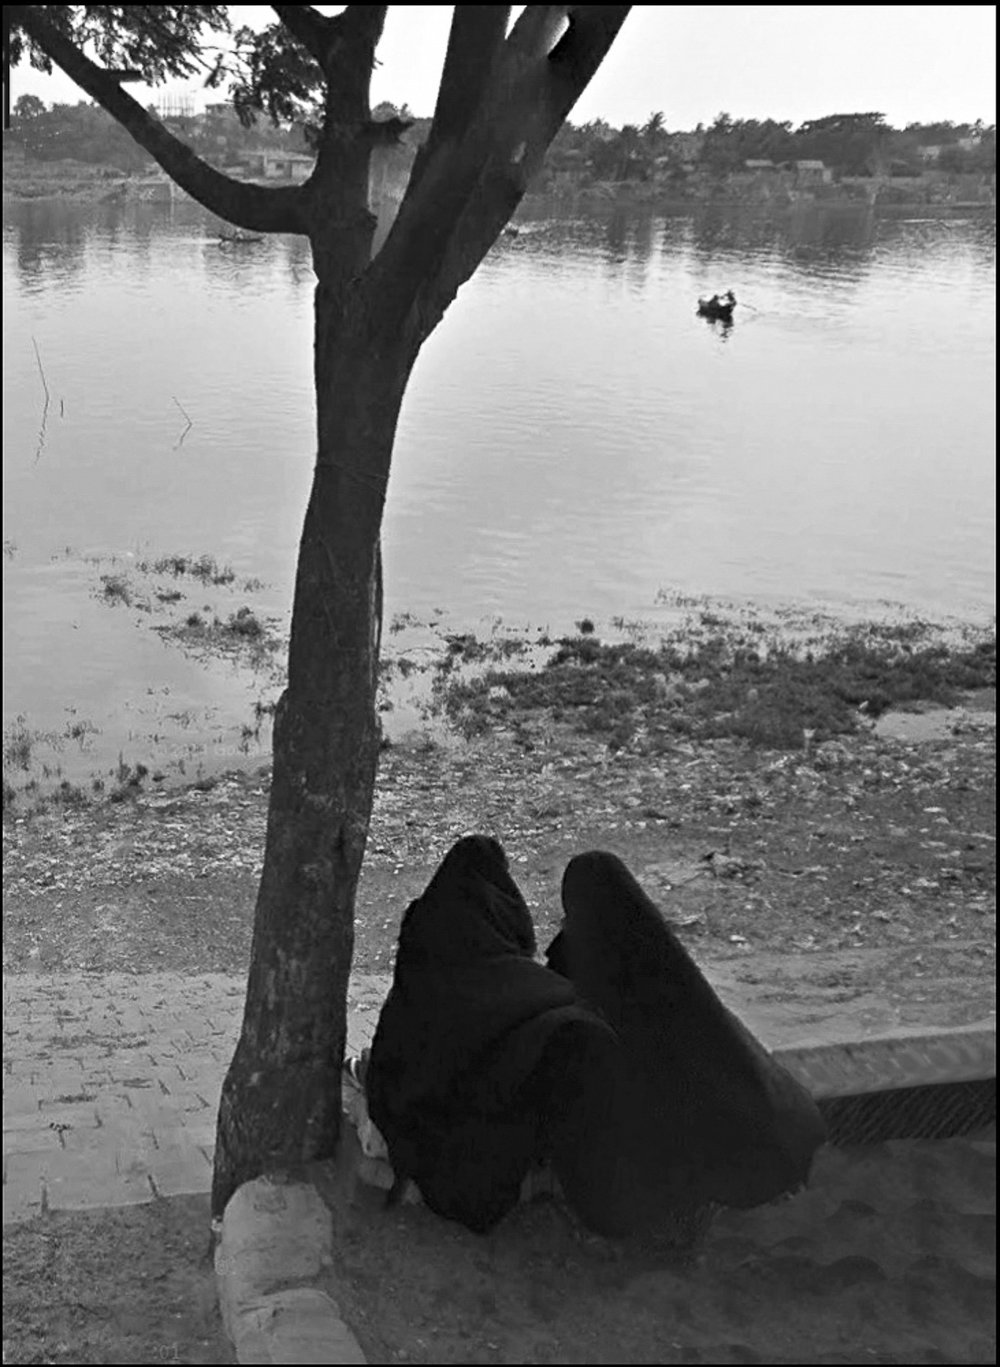 bangladesh_001bw-89-201.jpg